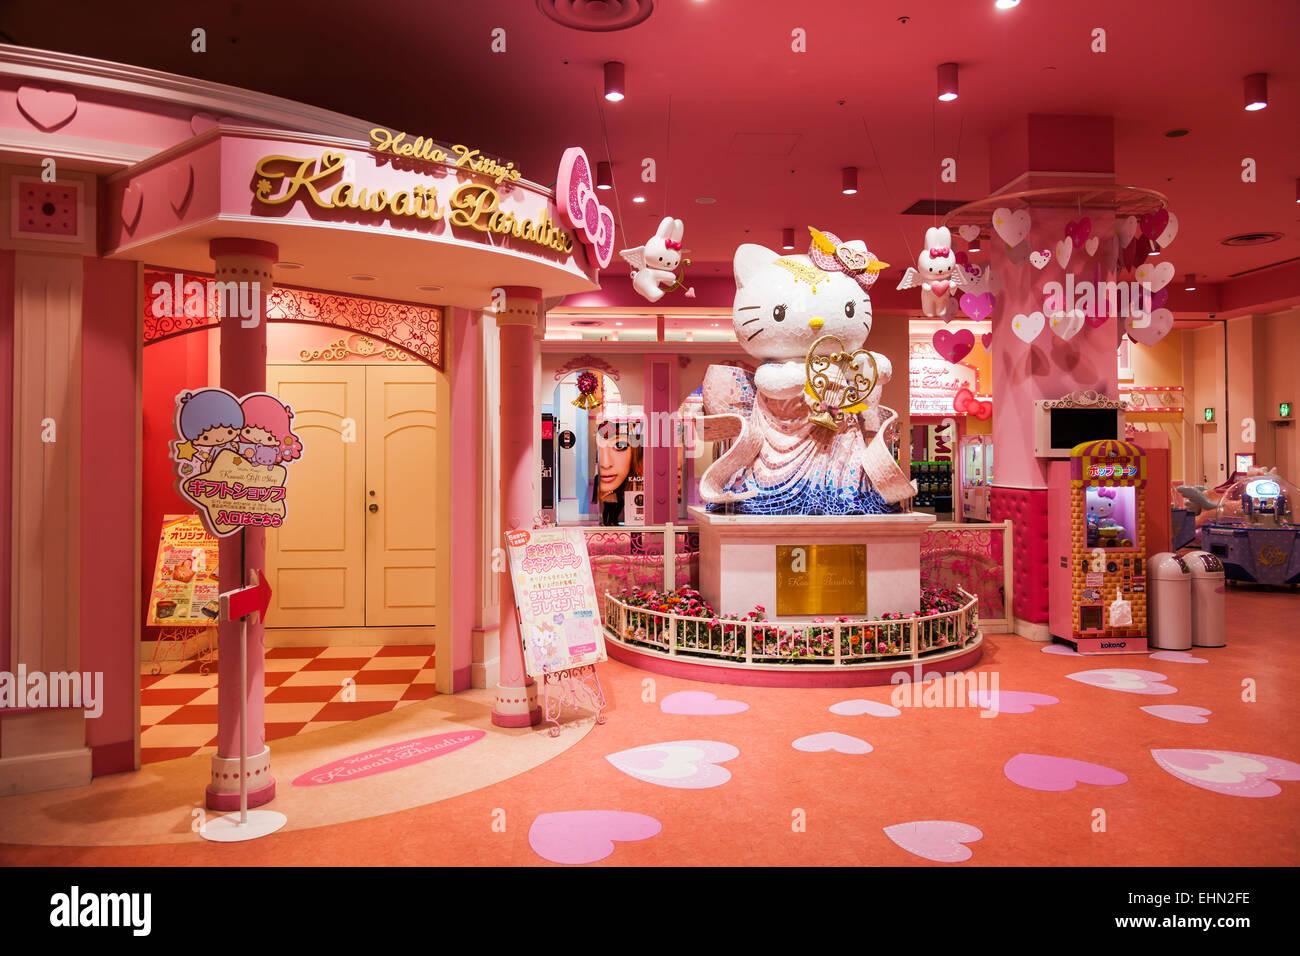 c02ea0e80 Hello Kitty® store, Tokyo, Japan Stock Photo: 79753618 - Alamy